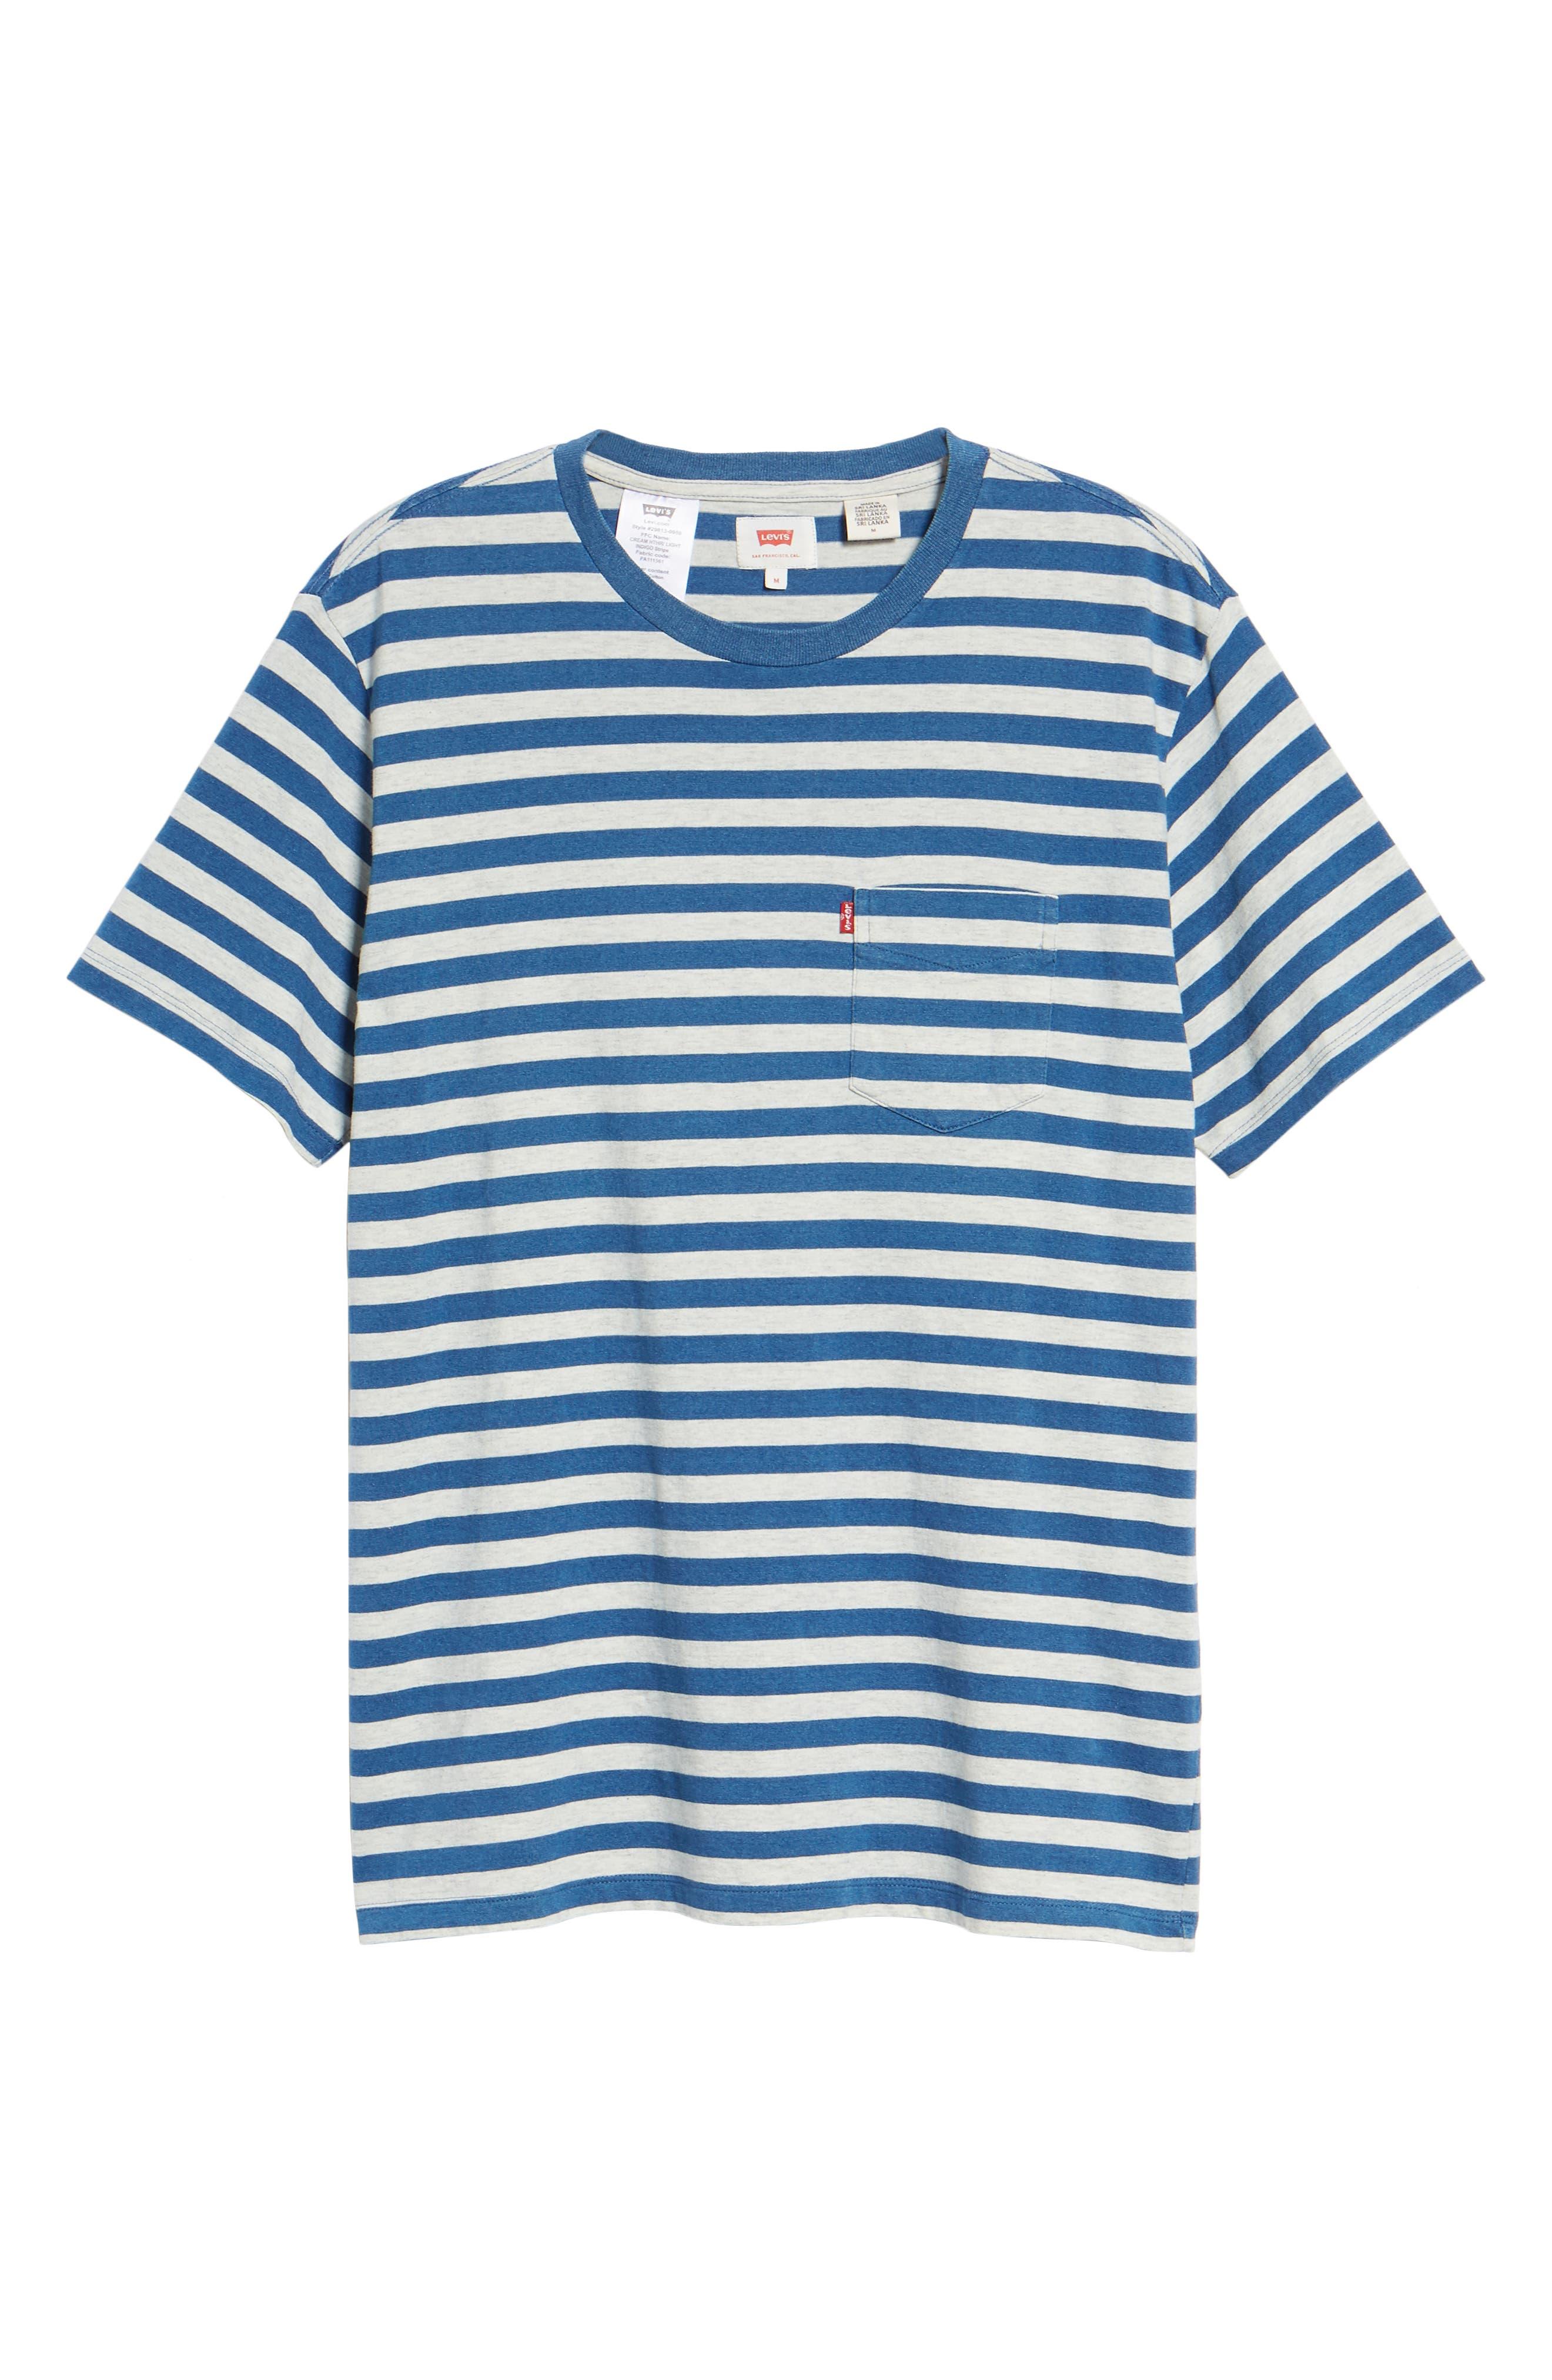 Sunset Stripe Pocket T-Shirt,                             Alternate thumbnail 6, color,                             CREAM HALF INCH STRIPE